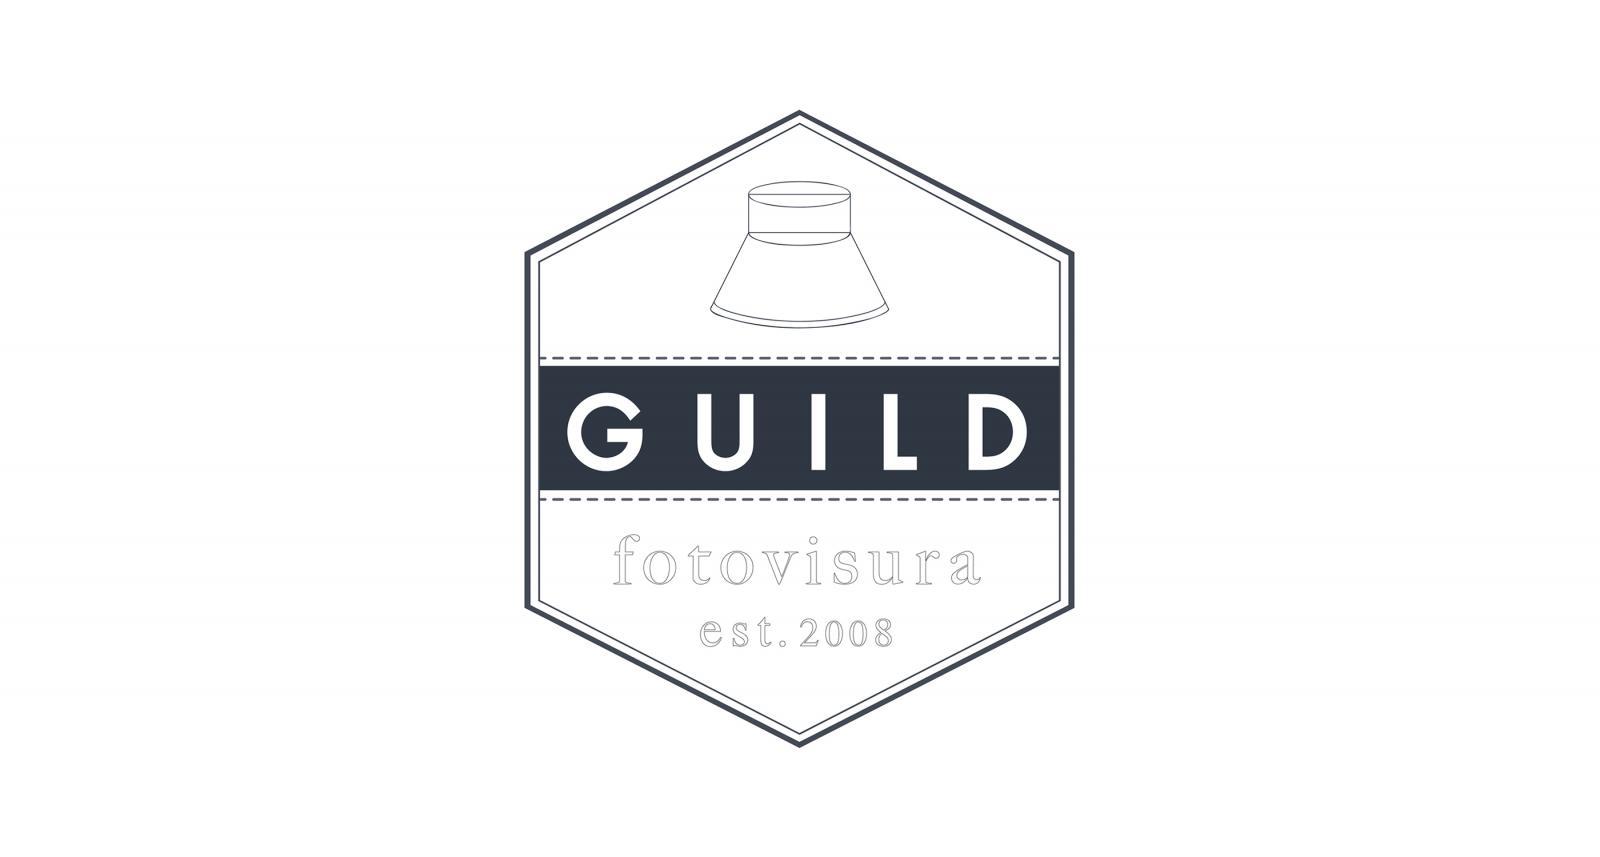 Photography image - Loading logo-editors-guild.jpg